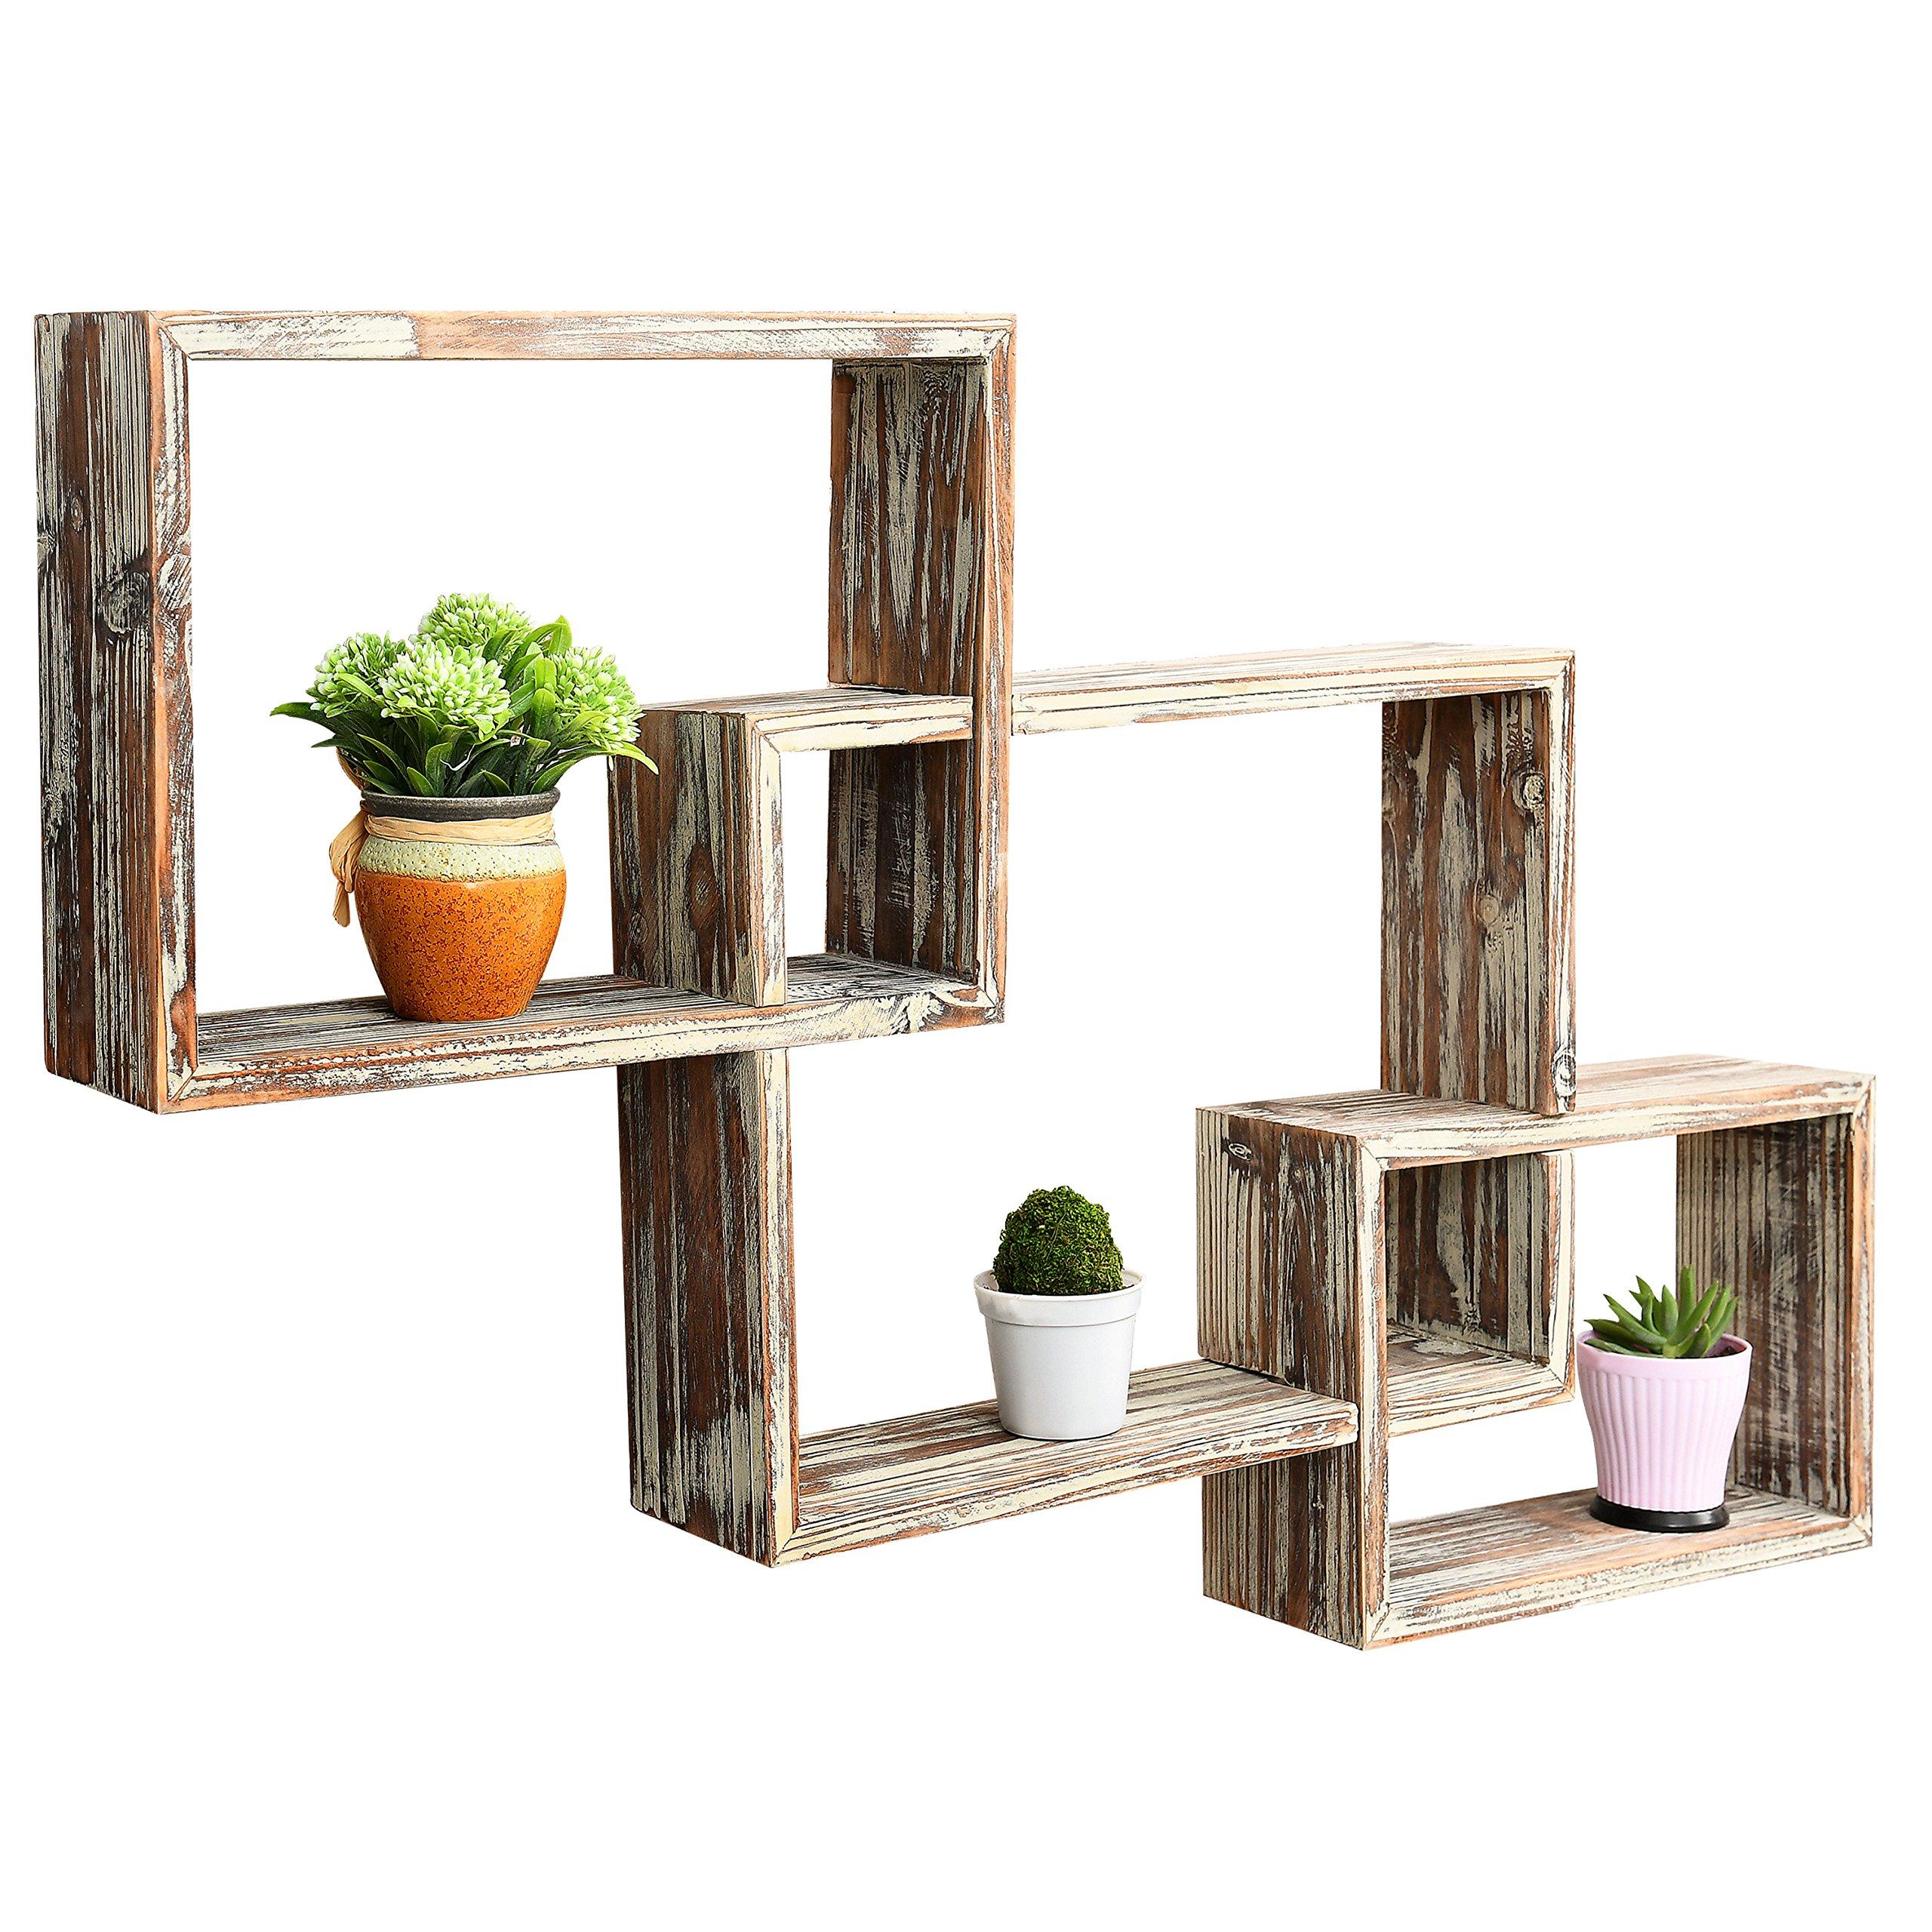 CDM product MyGift Wall-Mounted Country Rustic Brown Interlocking Shadow Box, Floating Box Display Shelves, Set of 3 big image